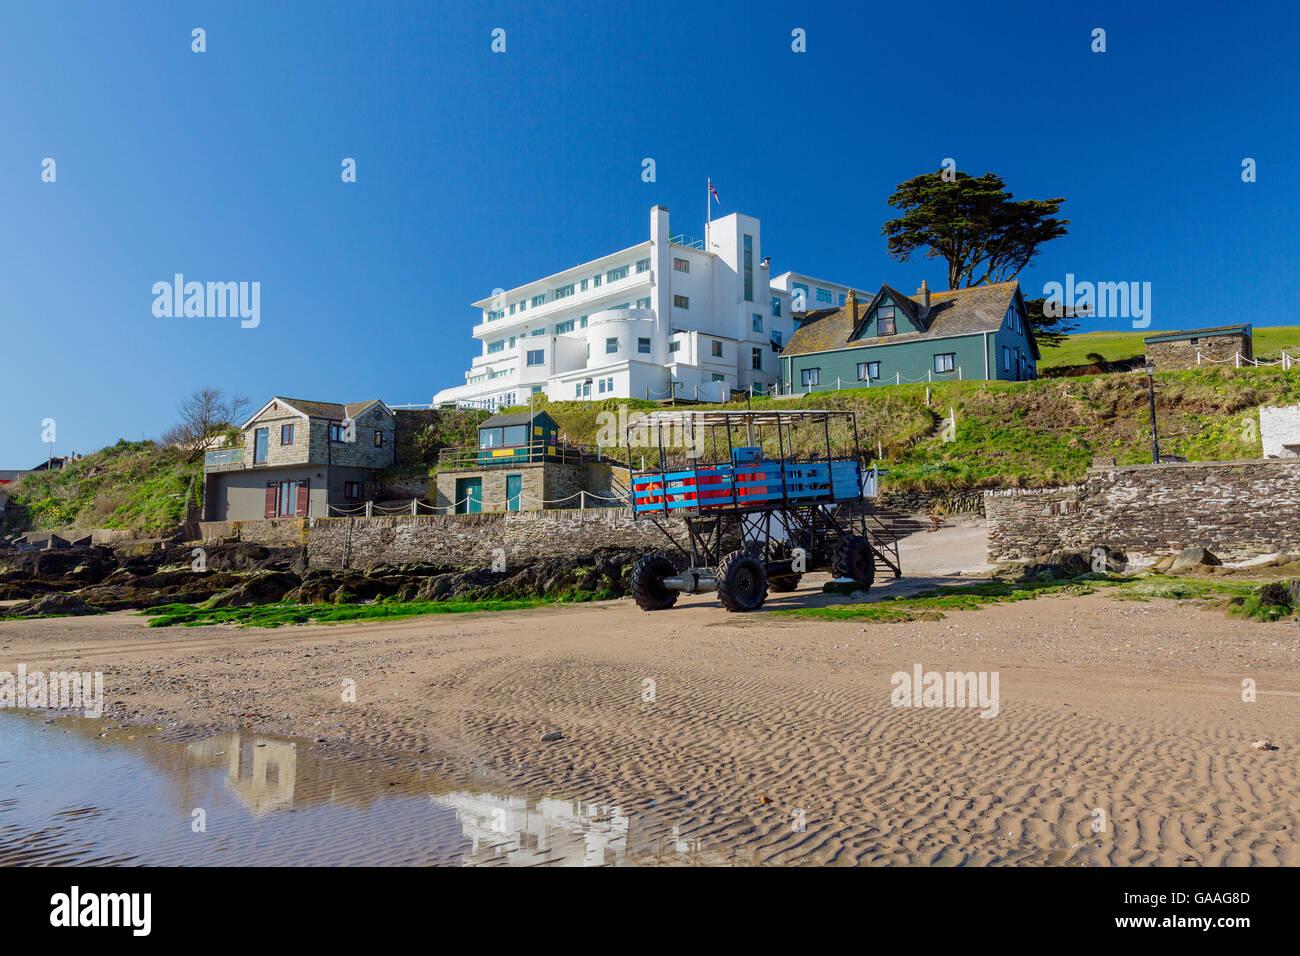 Burgh island hotel sea tractor stock photos burgh island for Art deco hotel devon